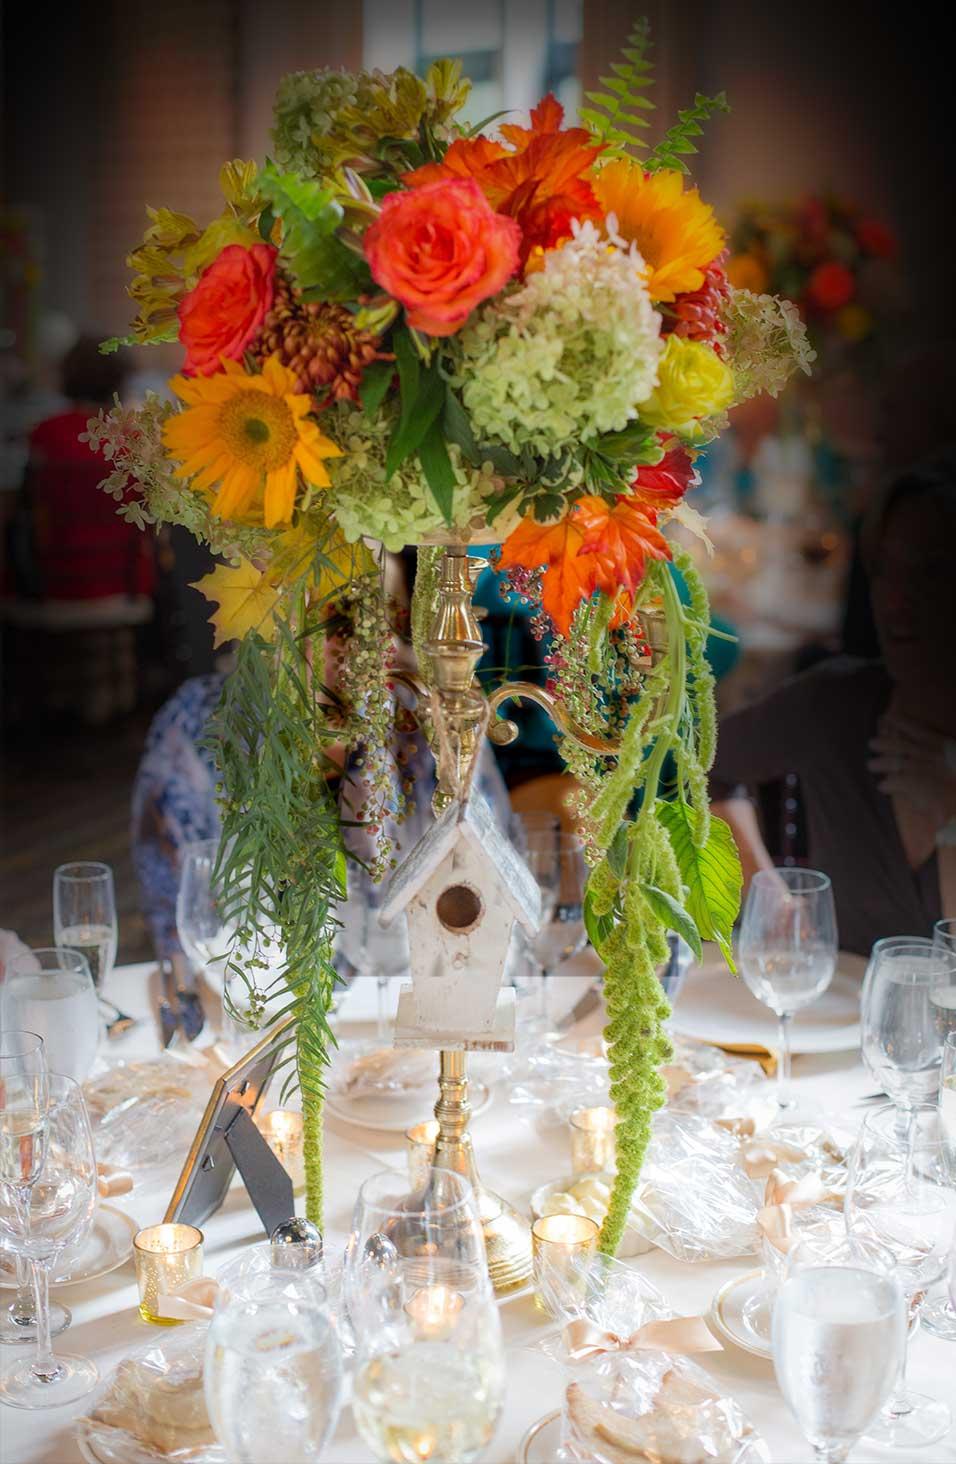 Birdhouse Themed Floral Centerpieces